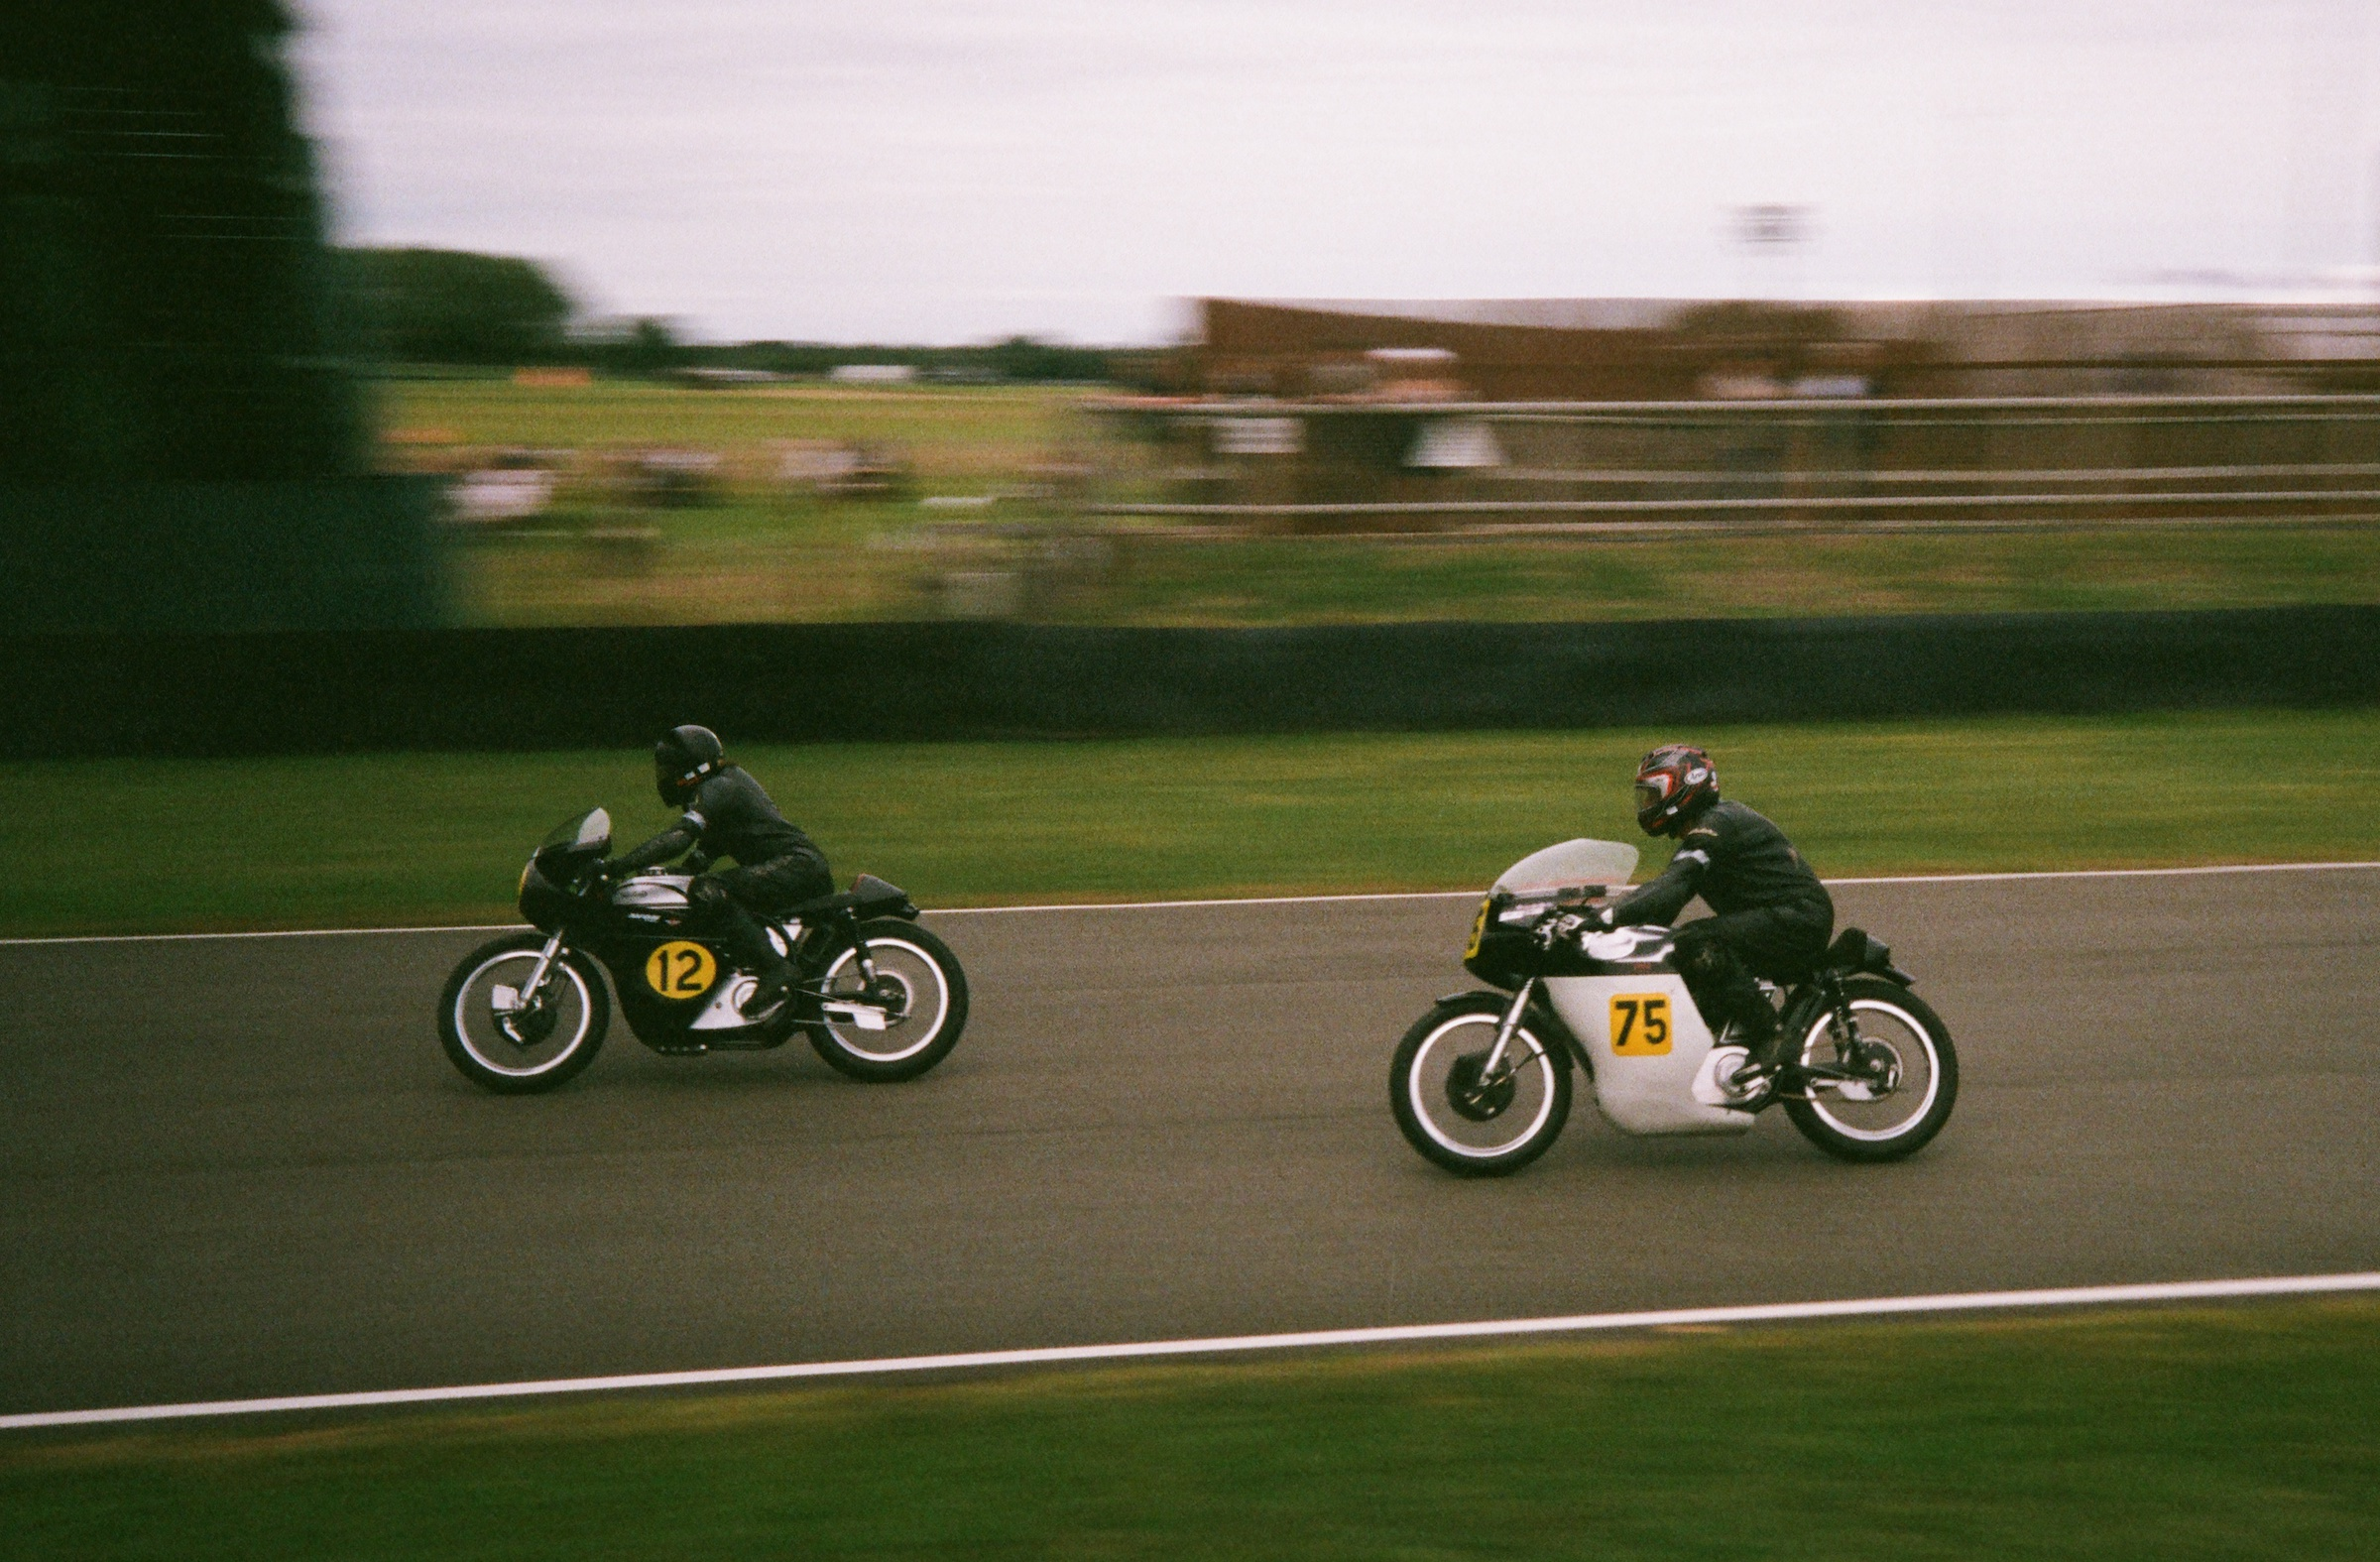 Goodwood Revival film vintage bike races